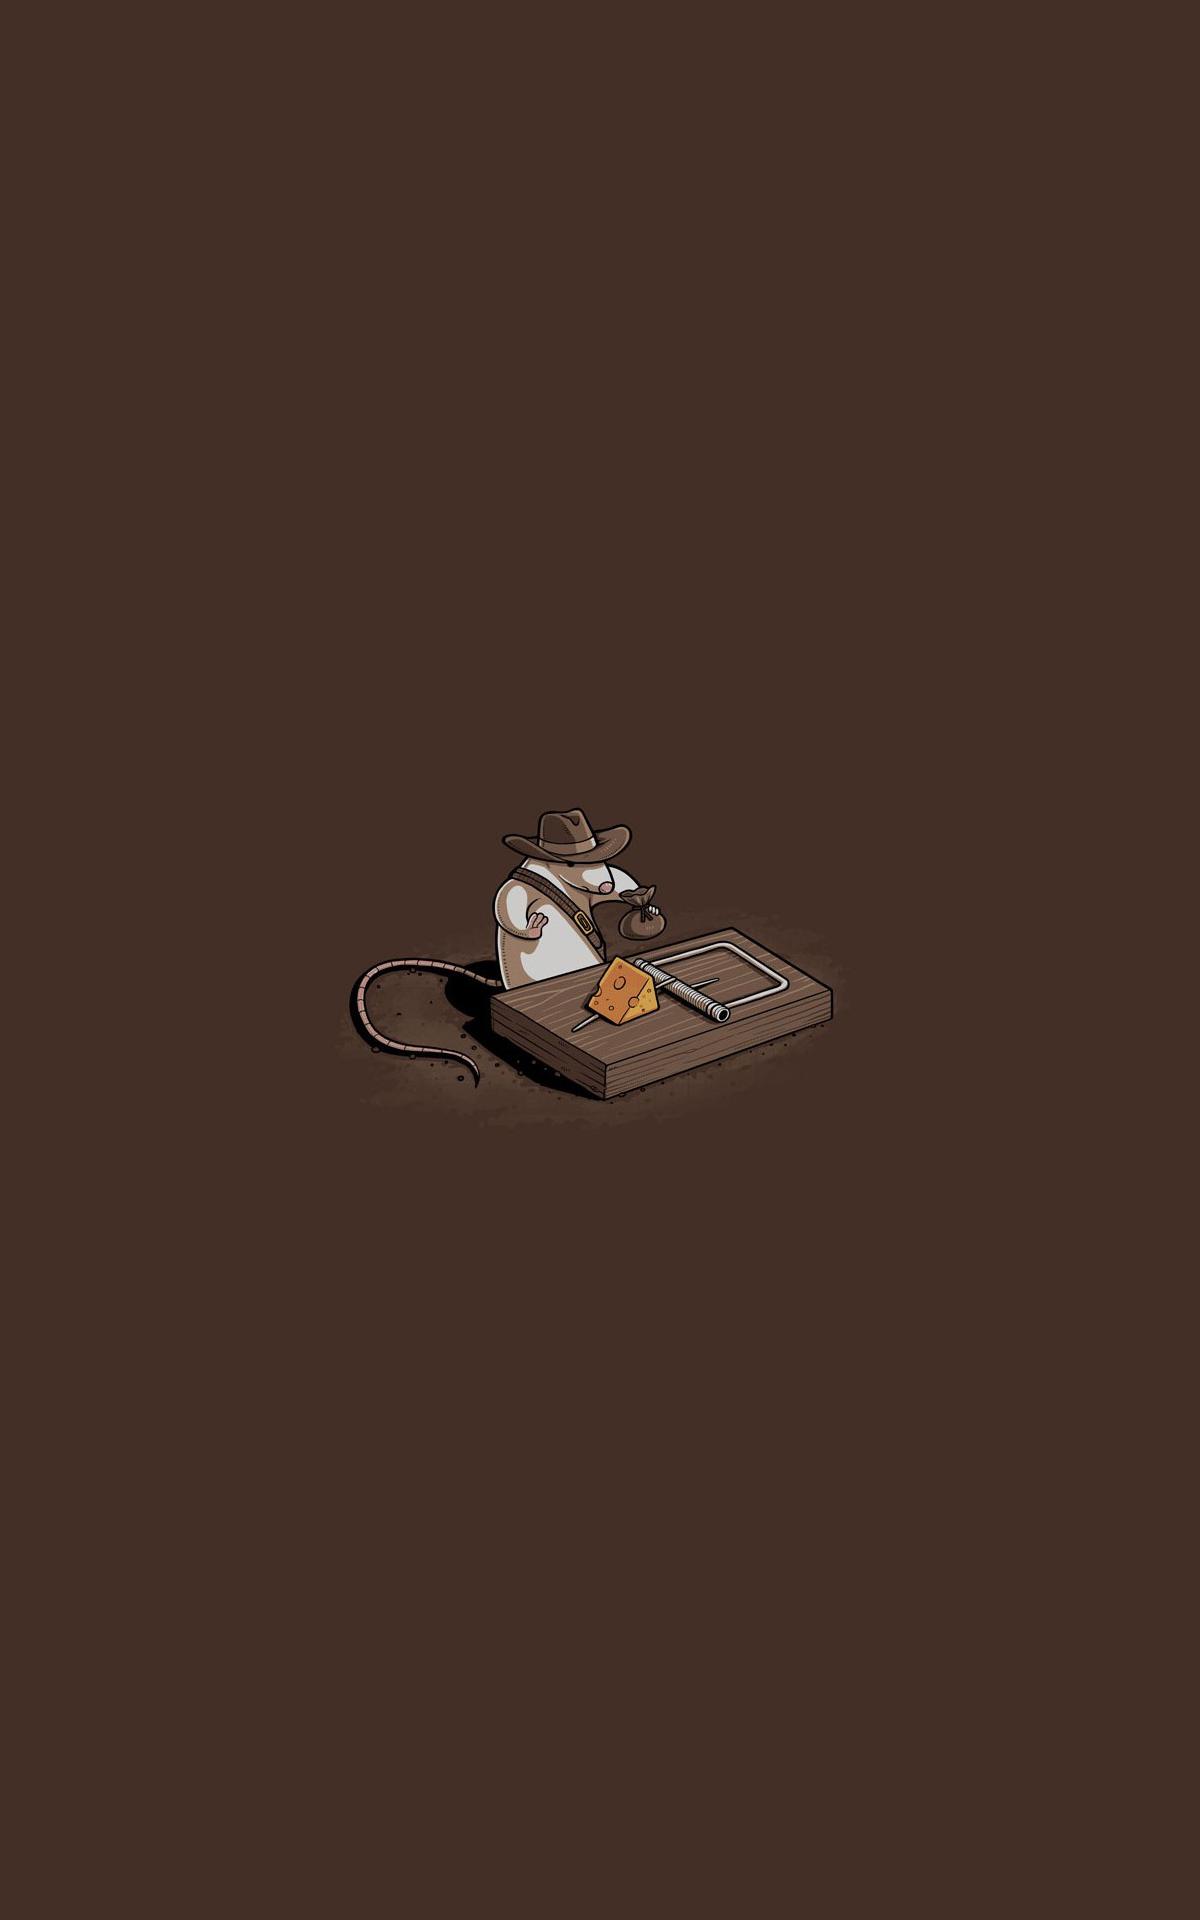 mice Indiana Jones humor parody minimalism portrait display